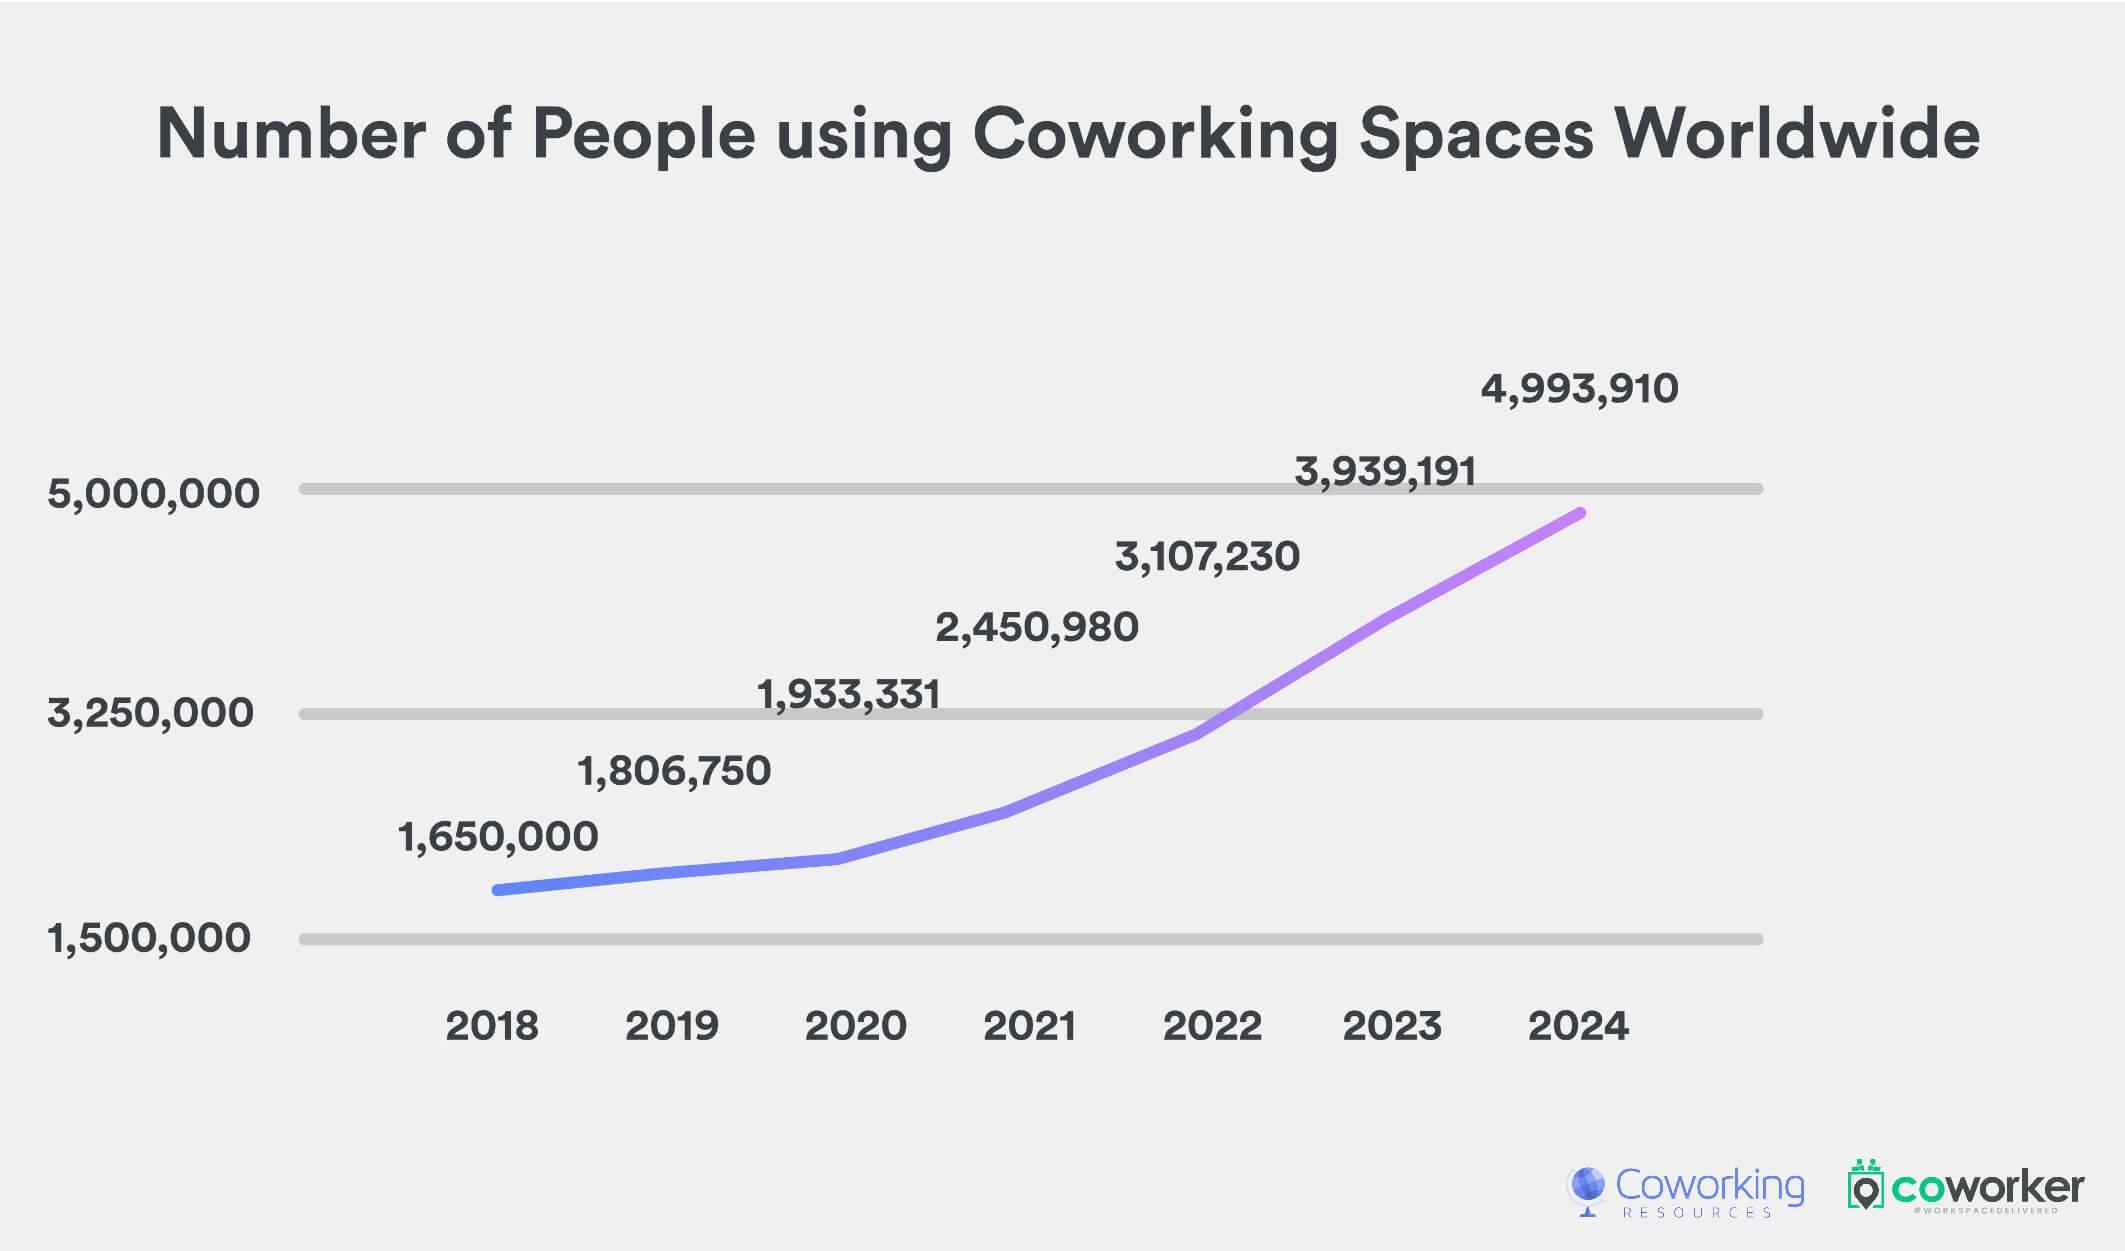 Global Coworking Growth Study 2020